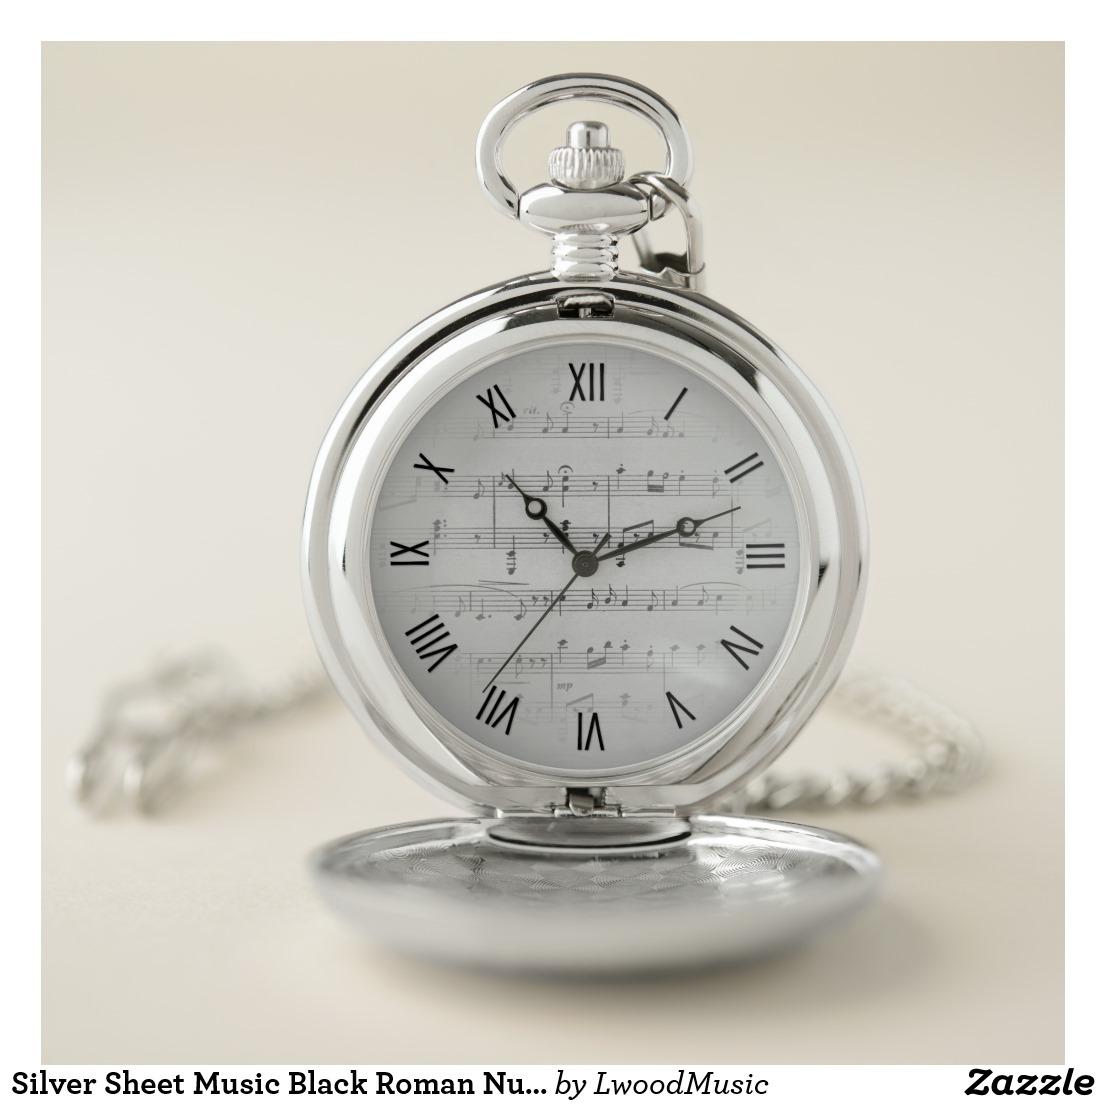 Silver Sheet Music Black Roman Numerals Pocket Watch